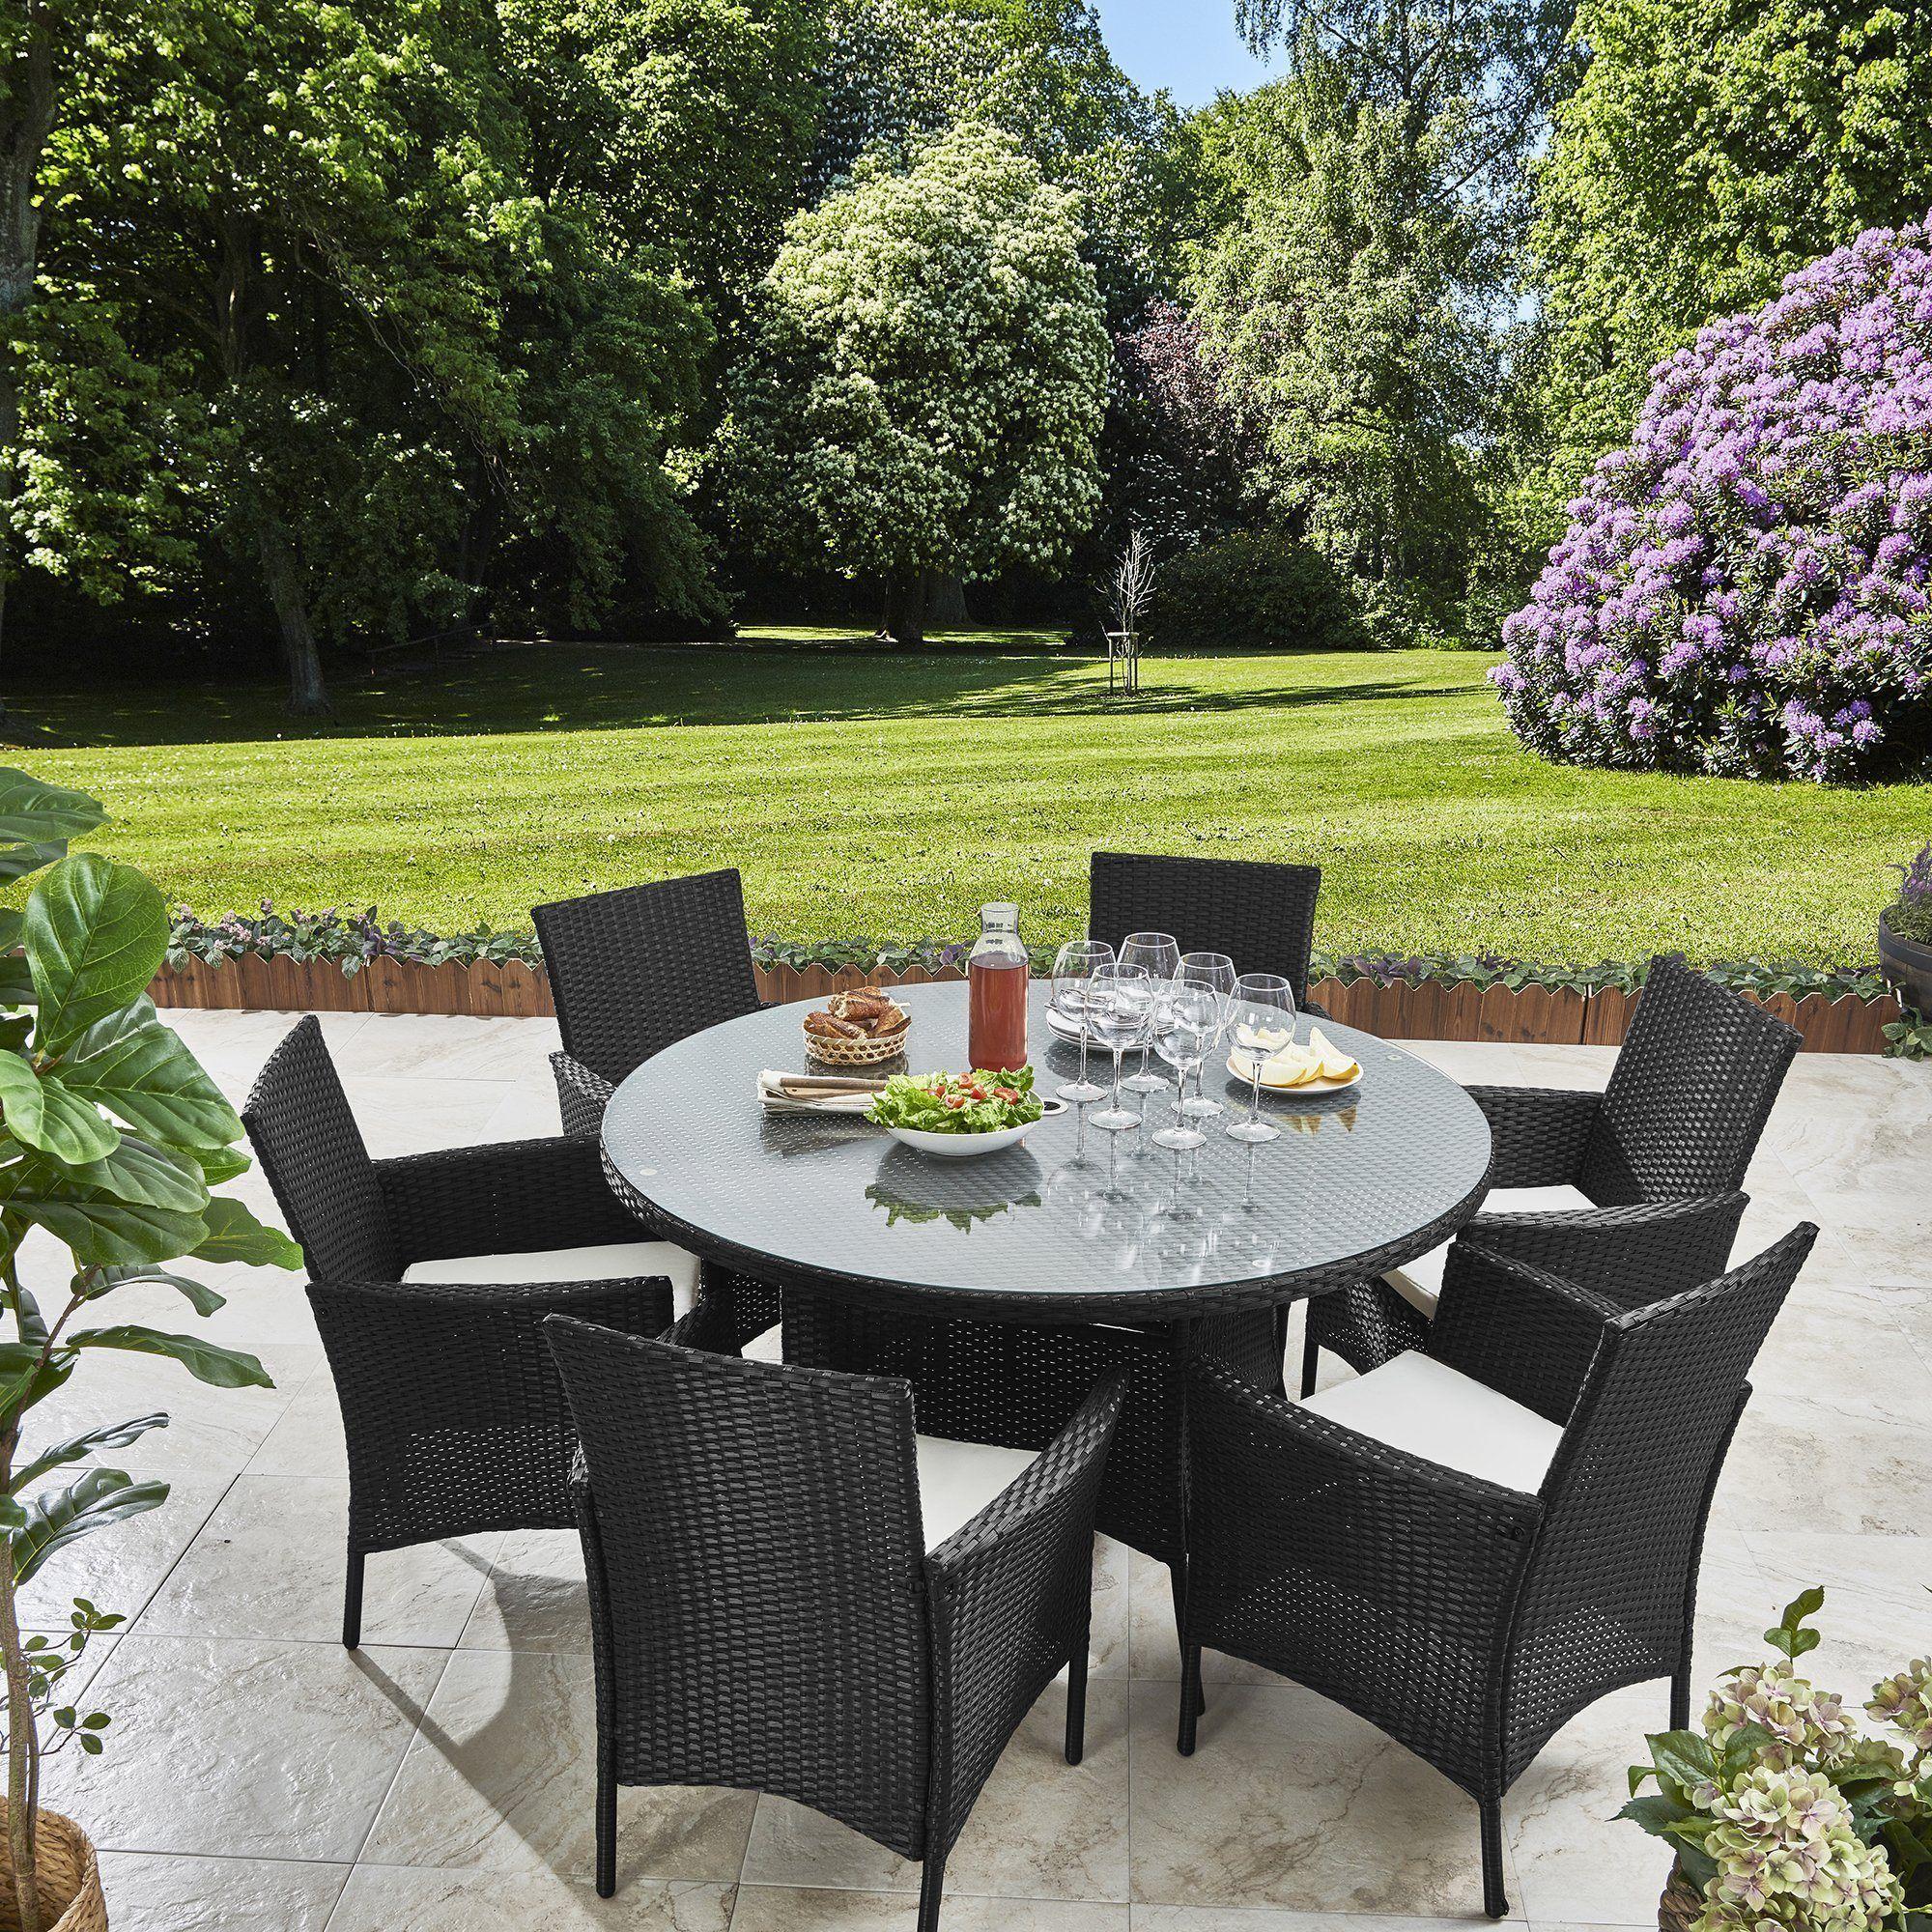 6 Seater Rattan Round Dining Table Set In Black Garden Furniture Outdoor Round Dining Set Grey Garden Furniture Round Dining Table Sets